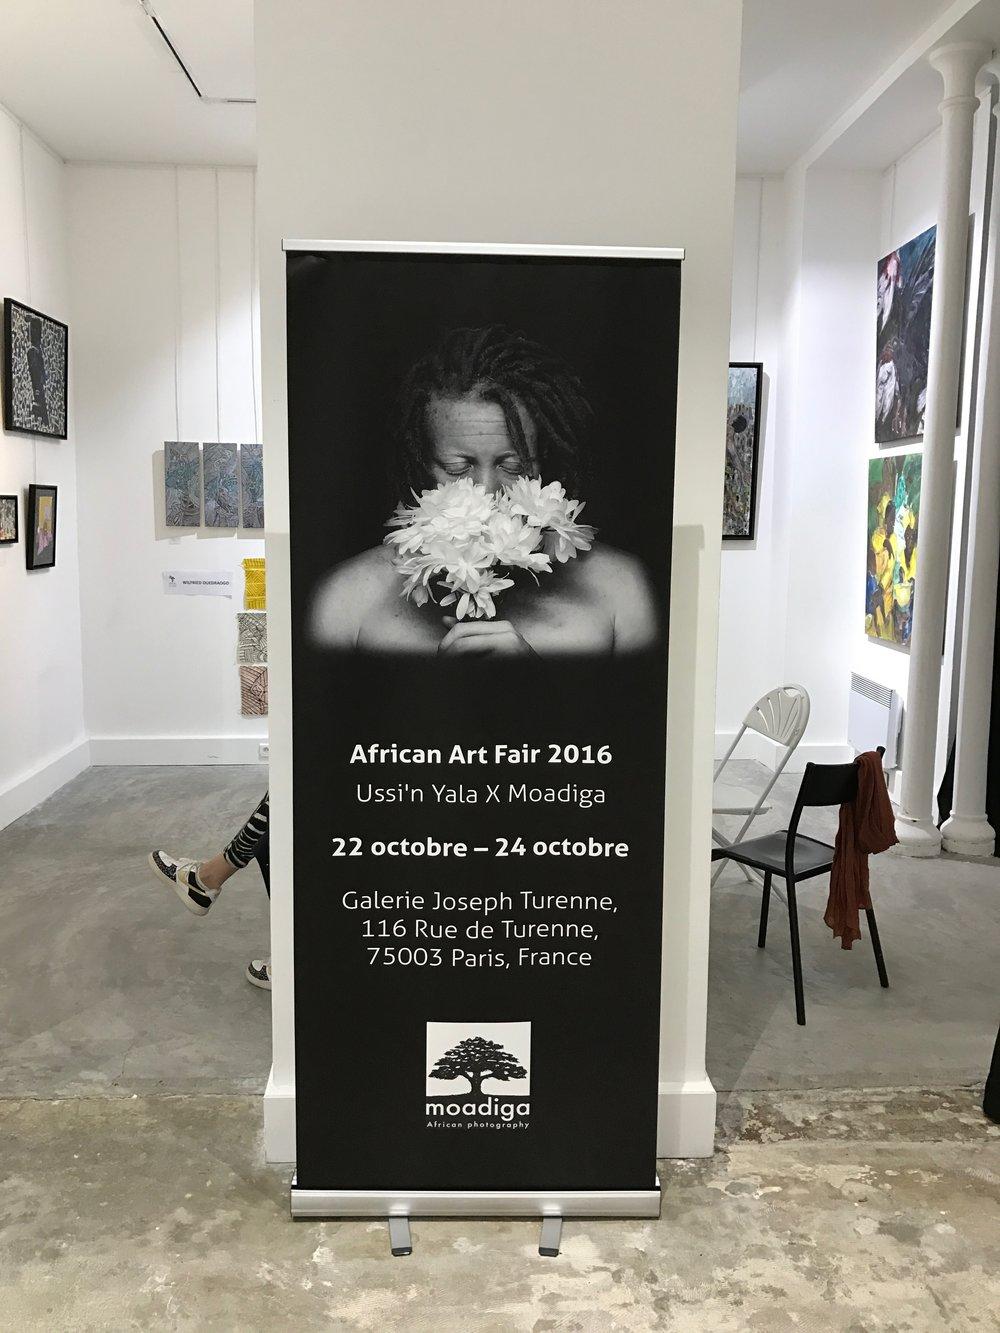 Promotion Moadiga à l'African Art Fair, 2016